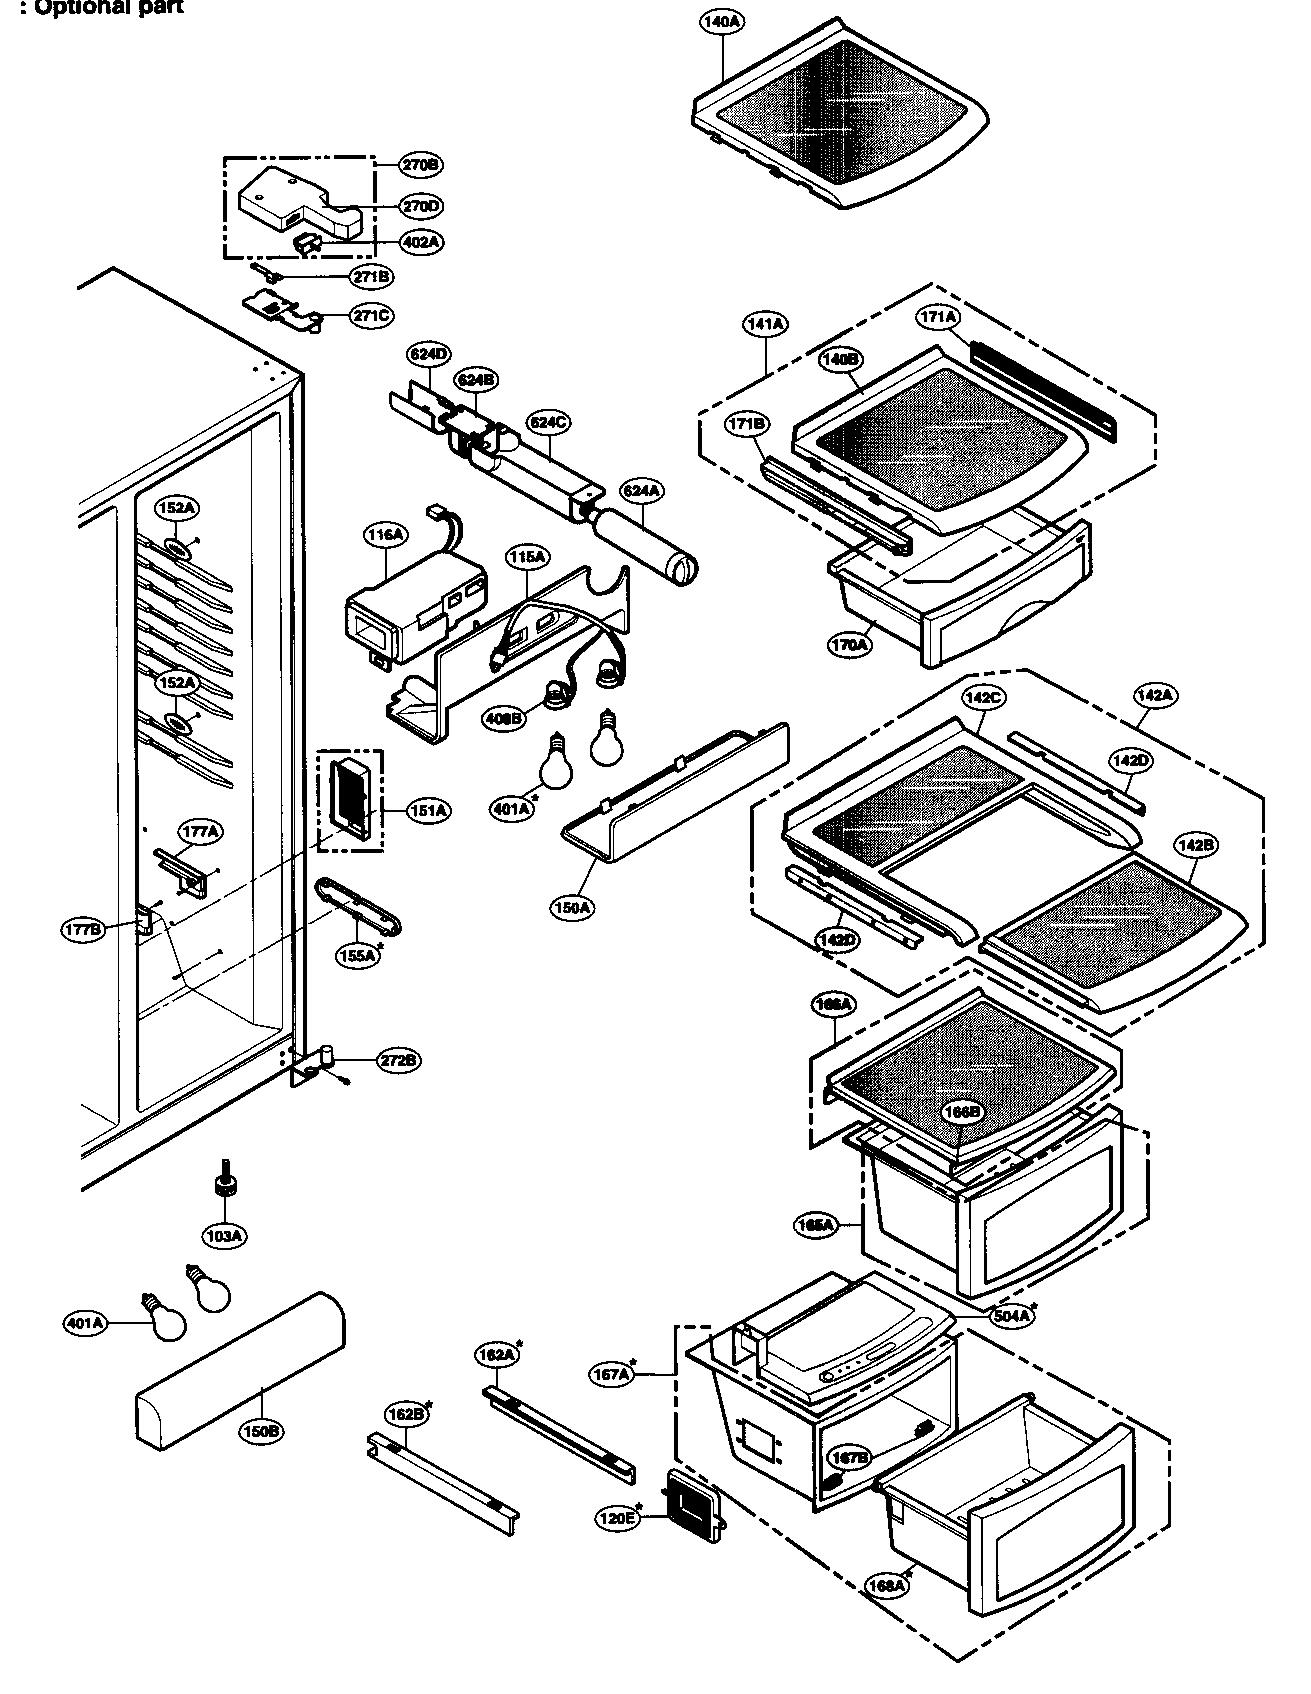 REFRIGERATOR COMPARTMENT Diagram & Parts List for Model